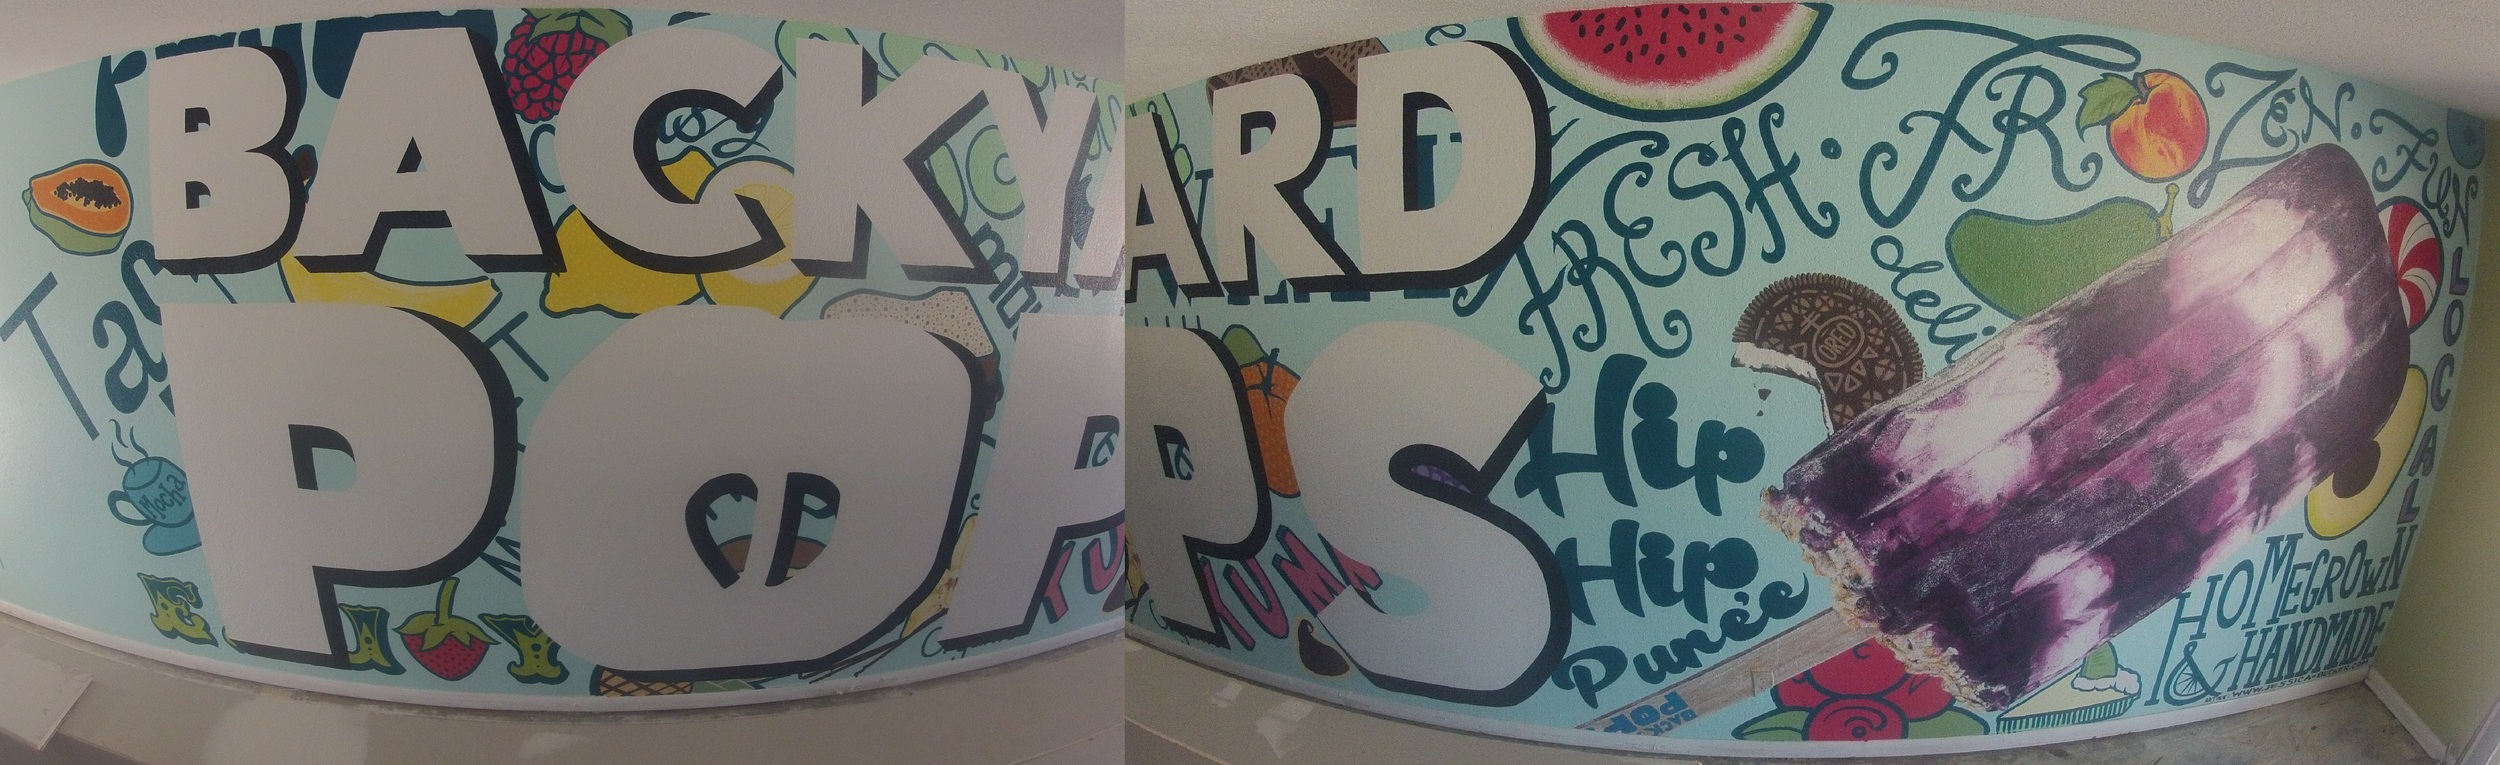 """DELICIOUS WALL"" BACKYARD POPS"